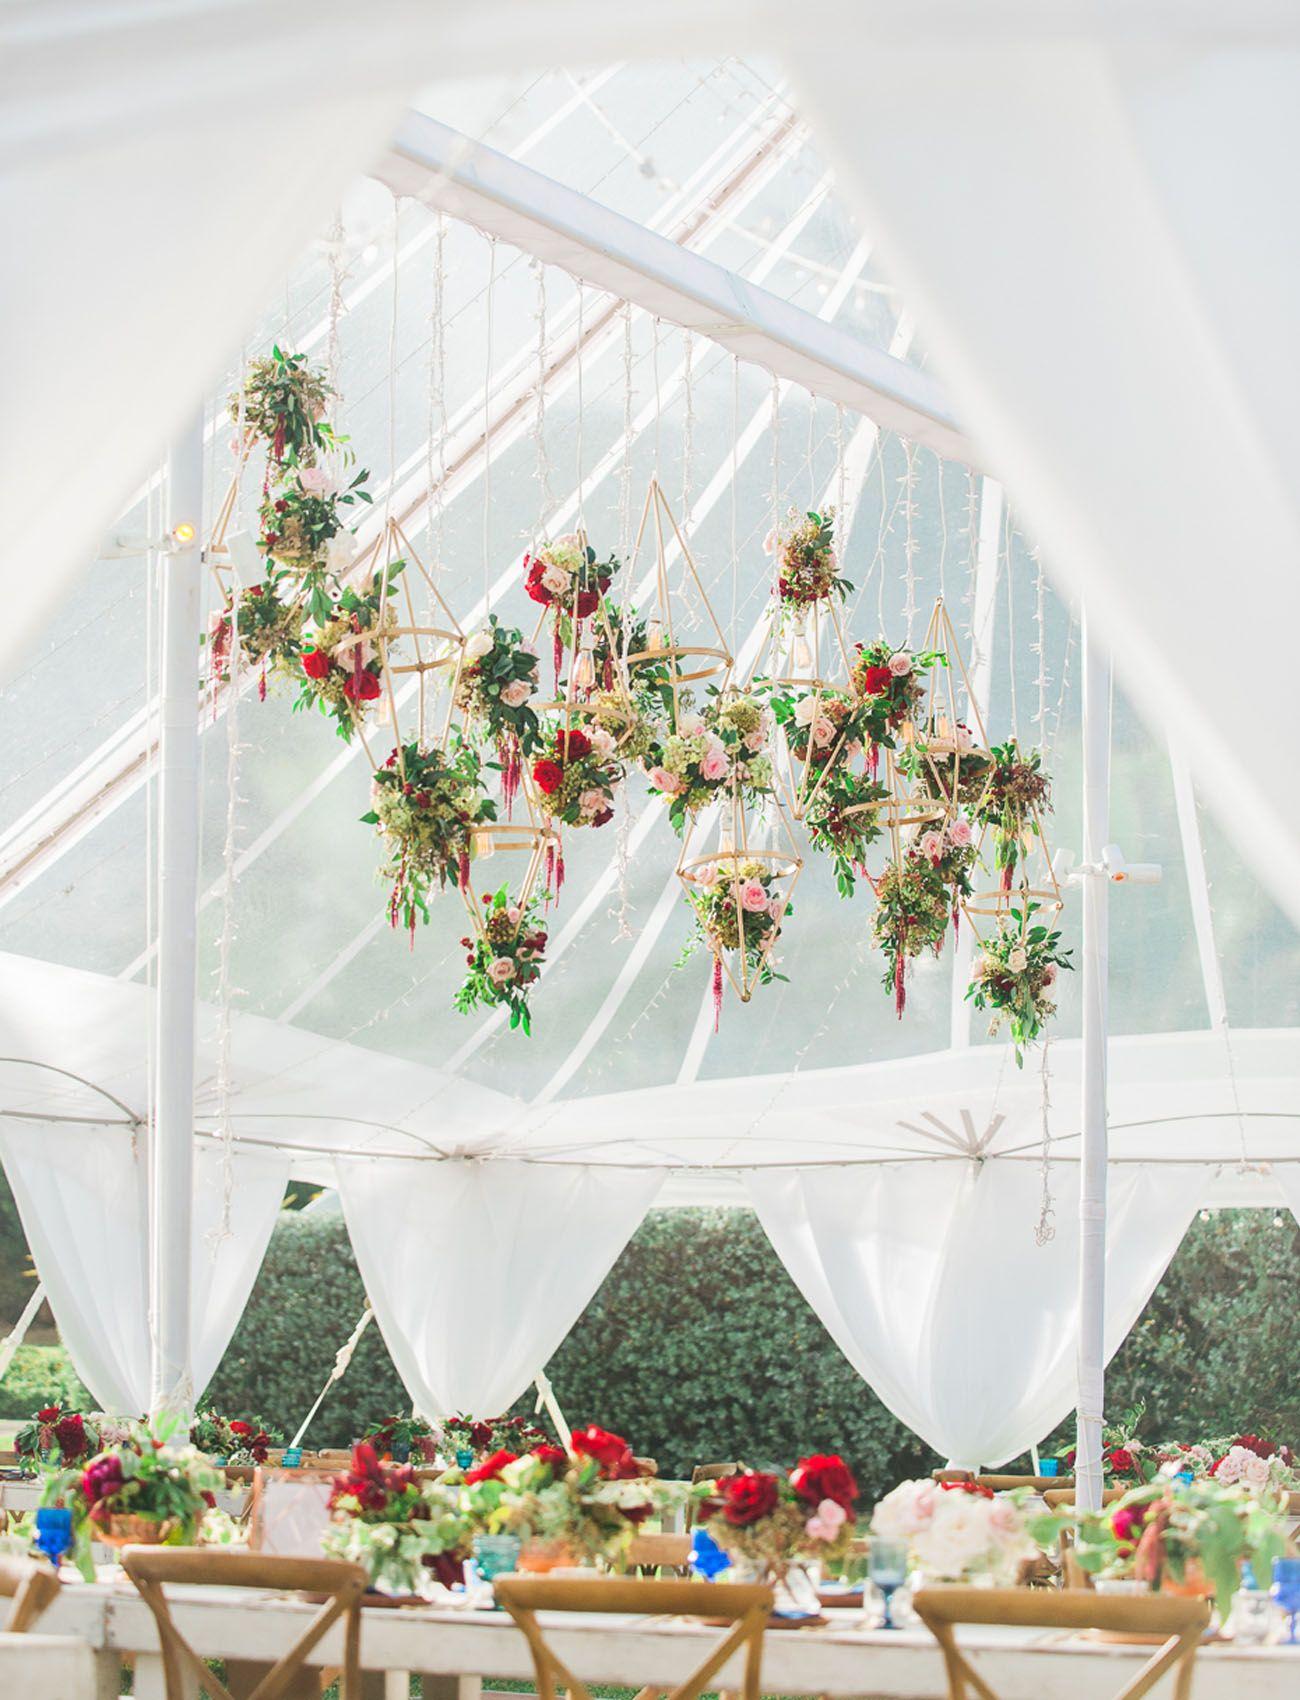 Audrina Patridge + Corey Bohan\'s Boho Chic Kauai Wedding | Pinterest ...